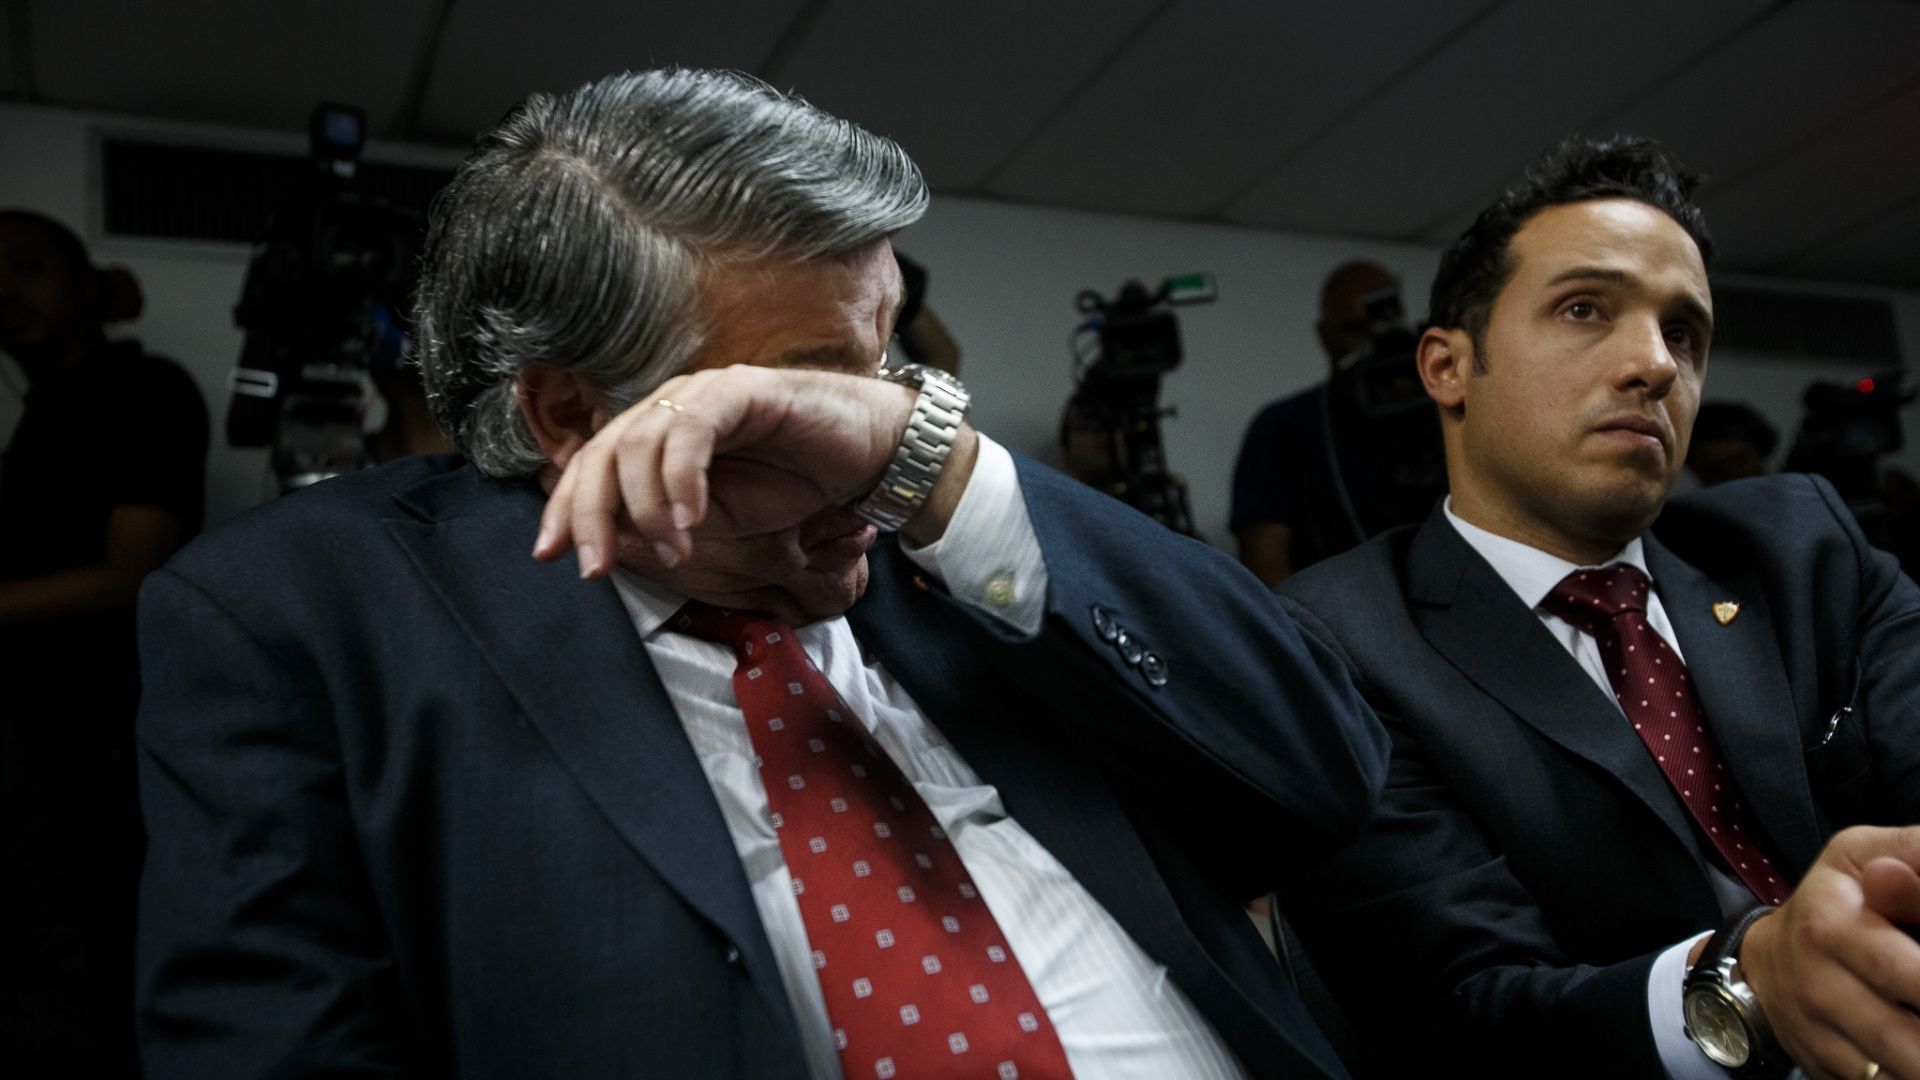 27.dez.2013 - Presidente da Portuguesa, Manuel da Lupa, aguarda o resultado do julgamento da Portuguesa no Pleno do STJD